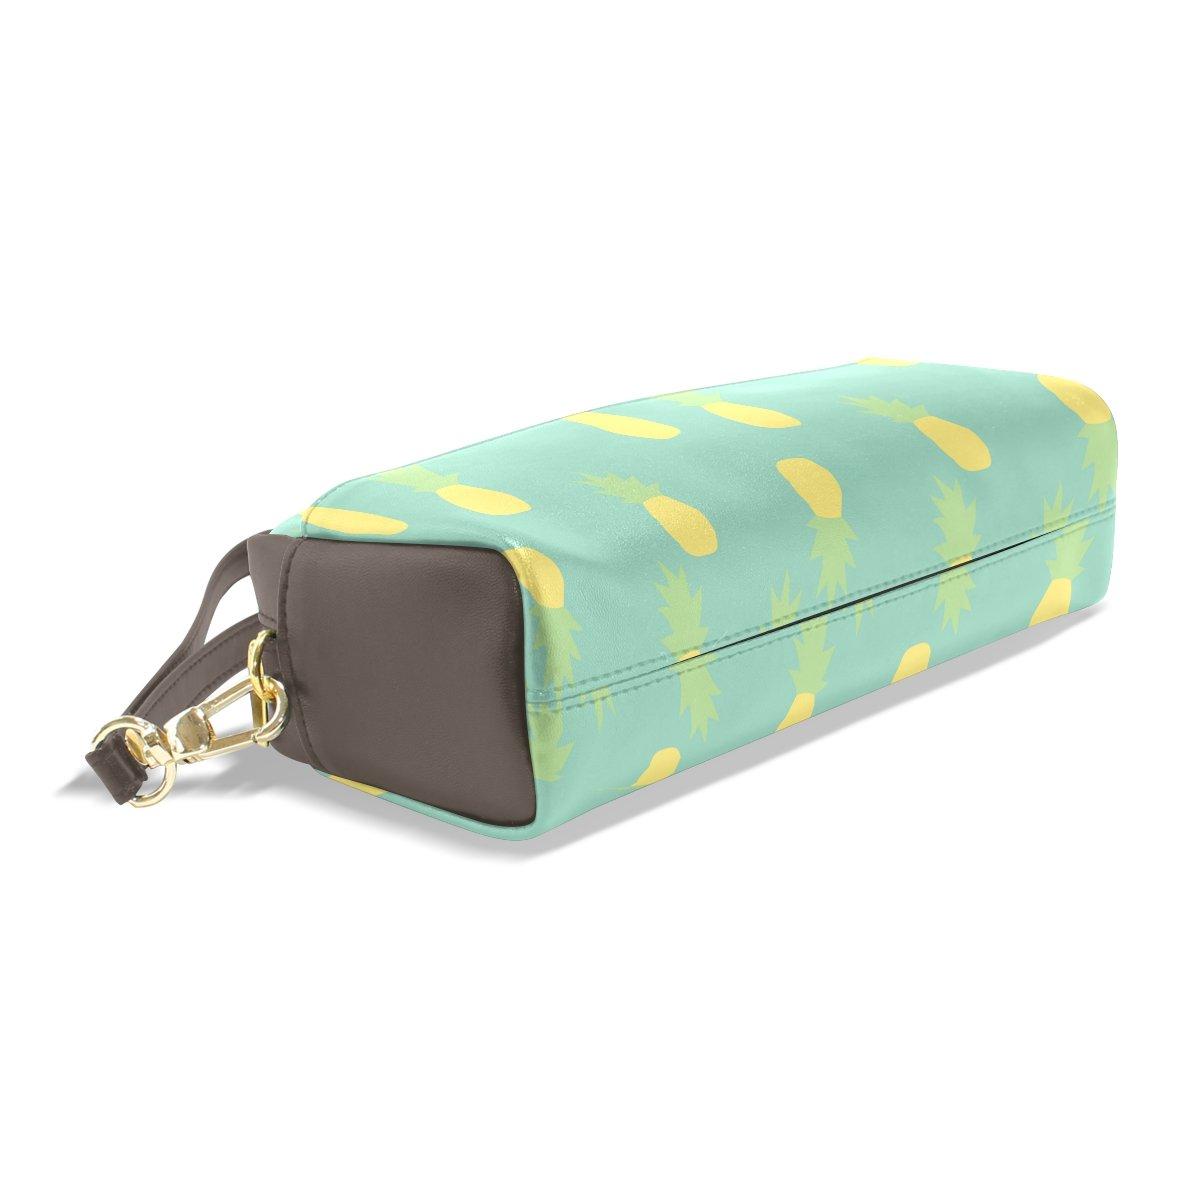 Amazon.com: YZGO - Estuche para lápices, diseño de aguacates ...